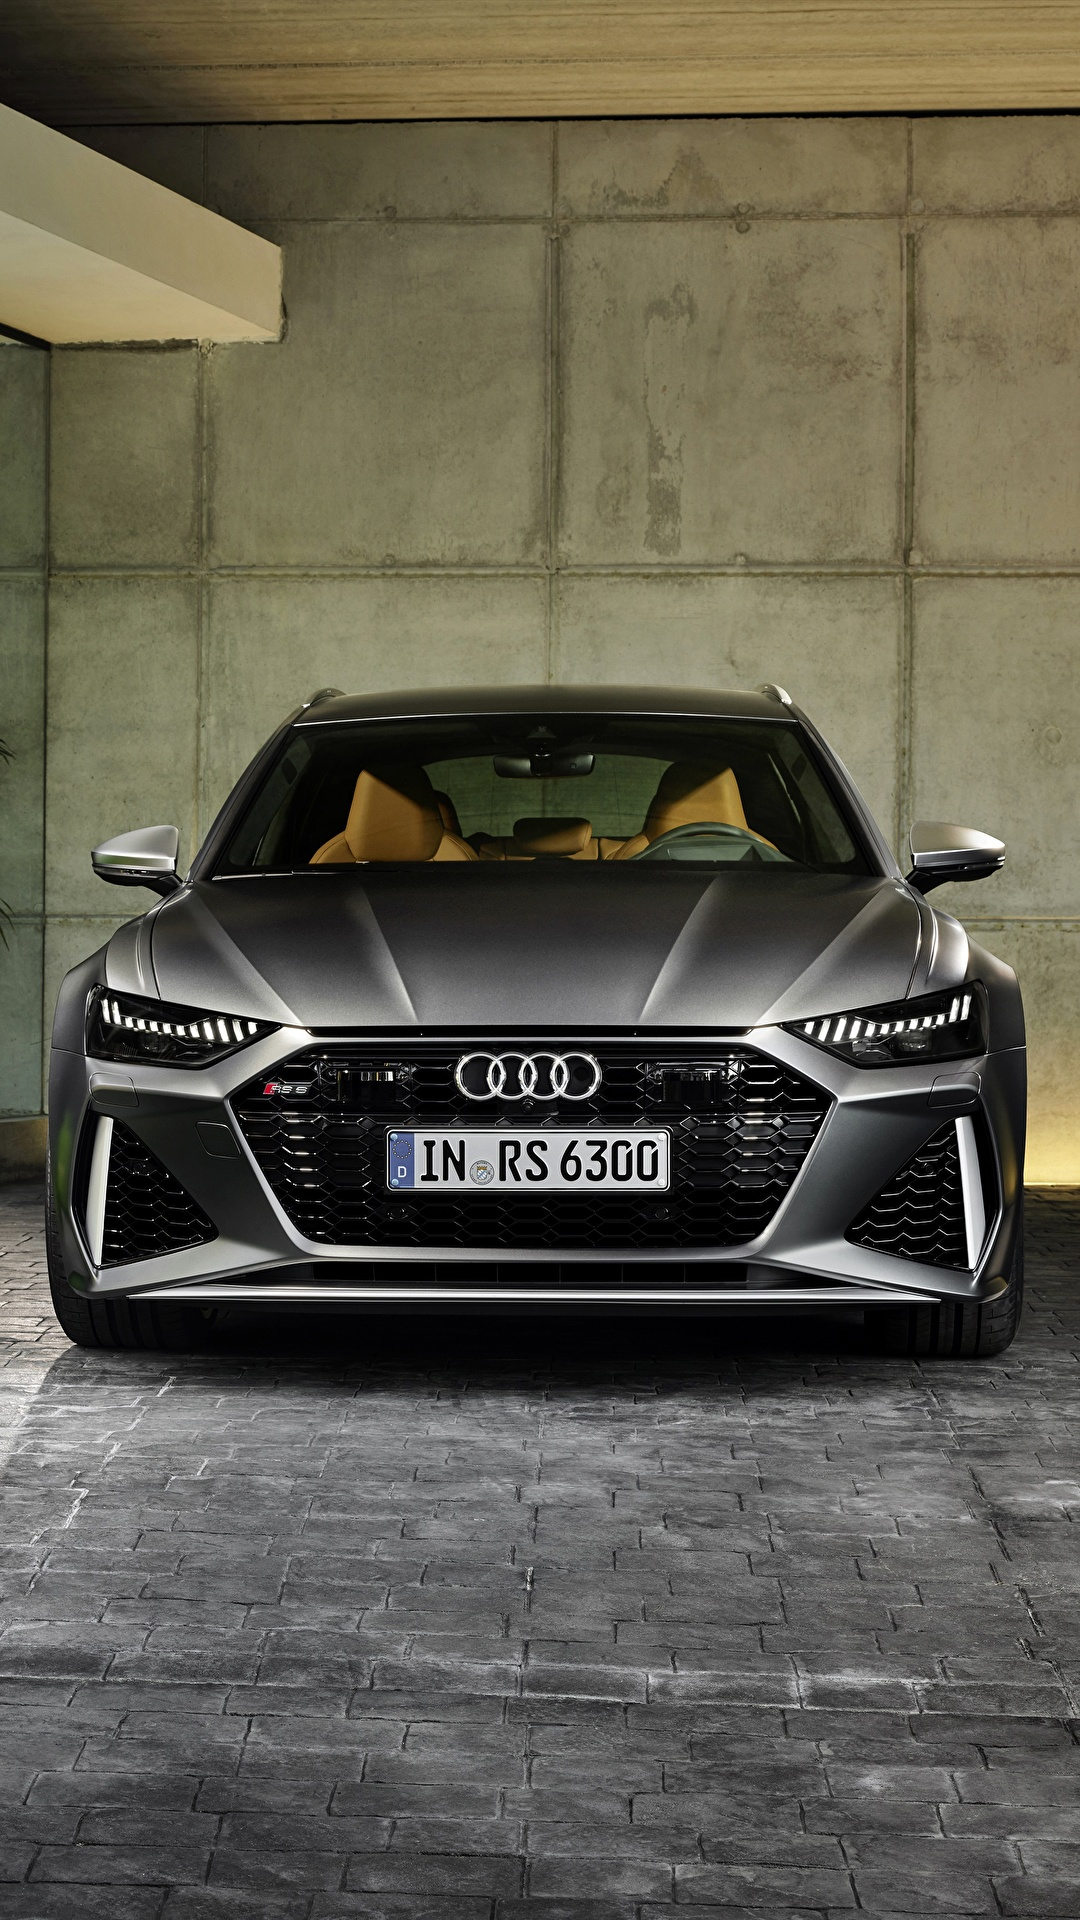 Bilder von Audi Kombi 2020 2019 V8 Twin-Turbo RS6 Avant Grau Vorne automobil 1080x1920 für Handy graue graues auto Autos